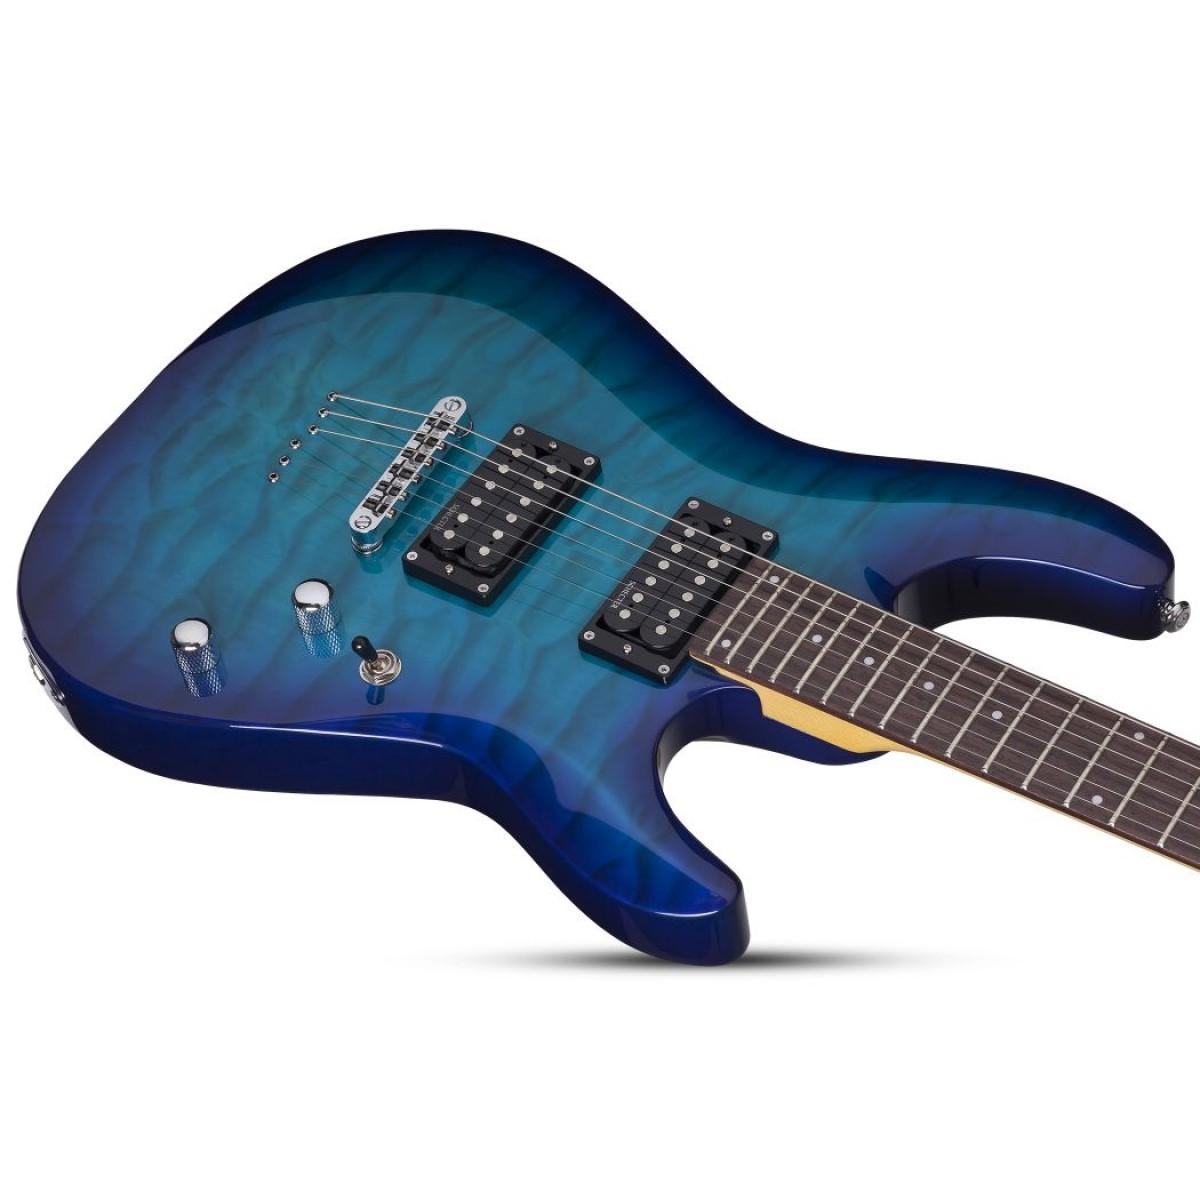 schecter sch443 c 6 plus ocean blue burst electric guitar. Black Bedroom Furniture Sets. Home Design Ideas